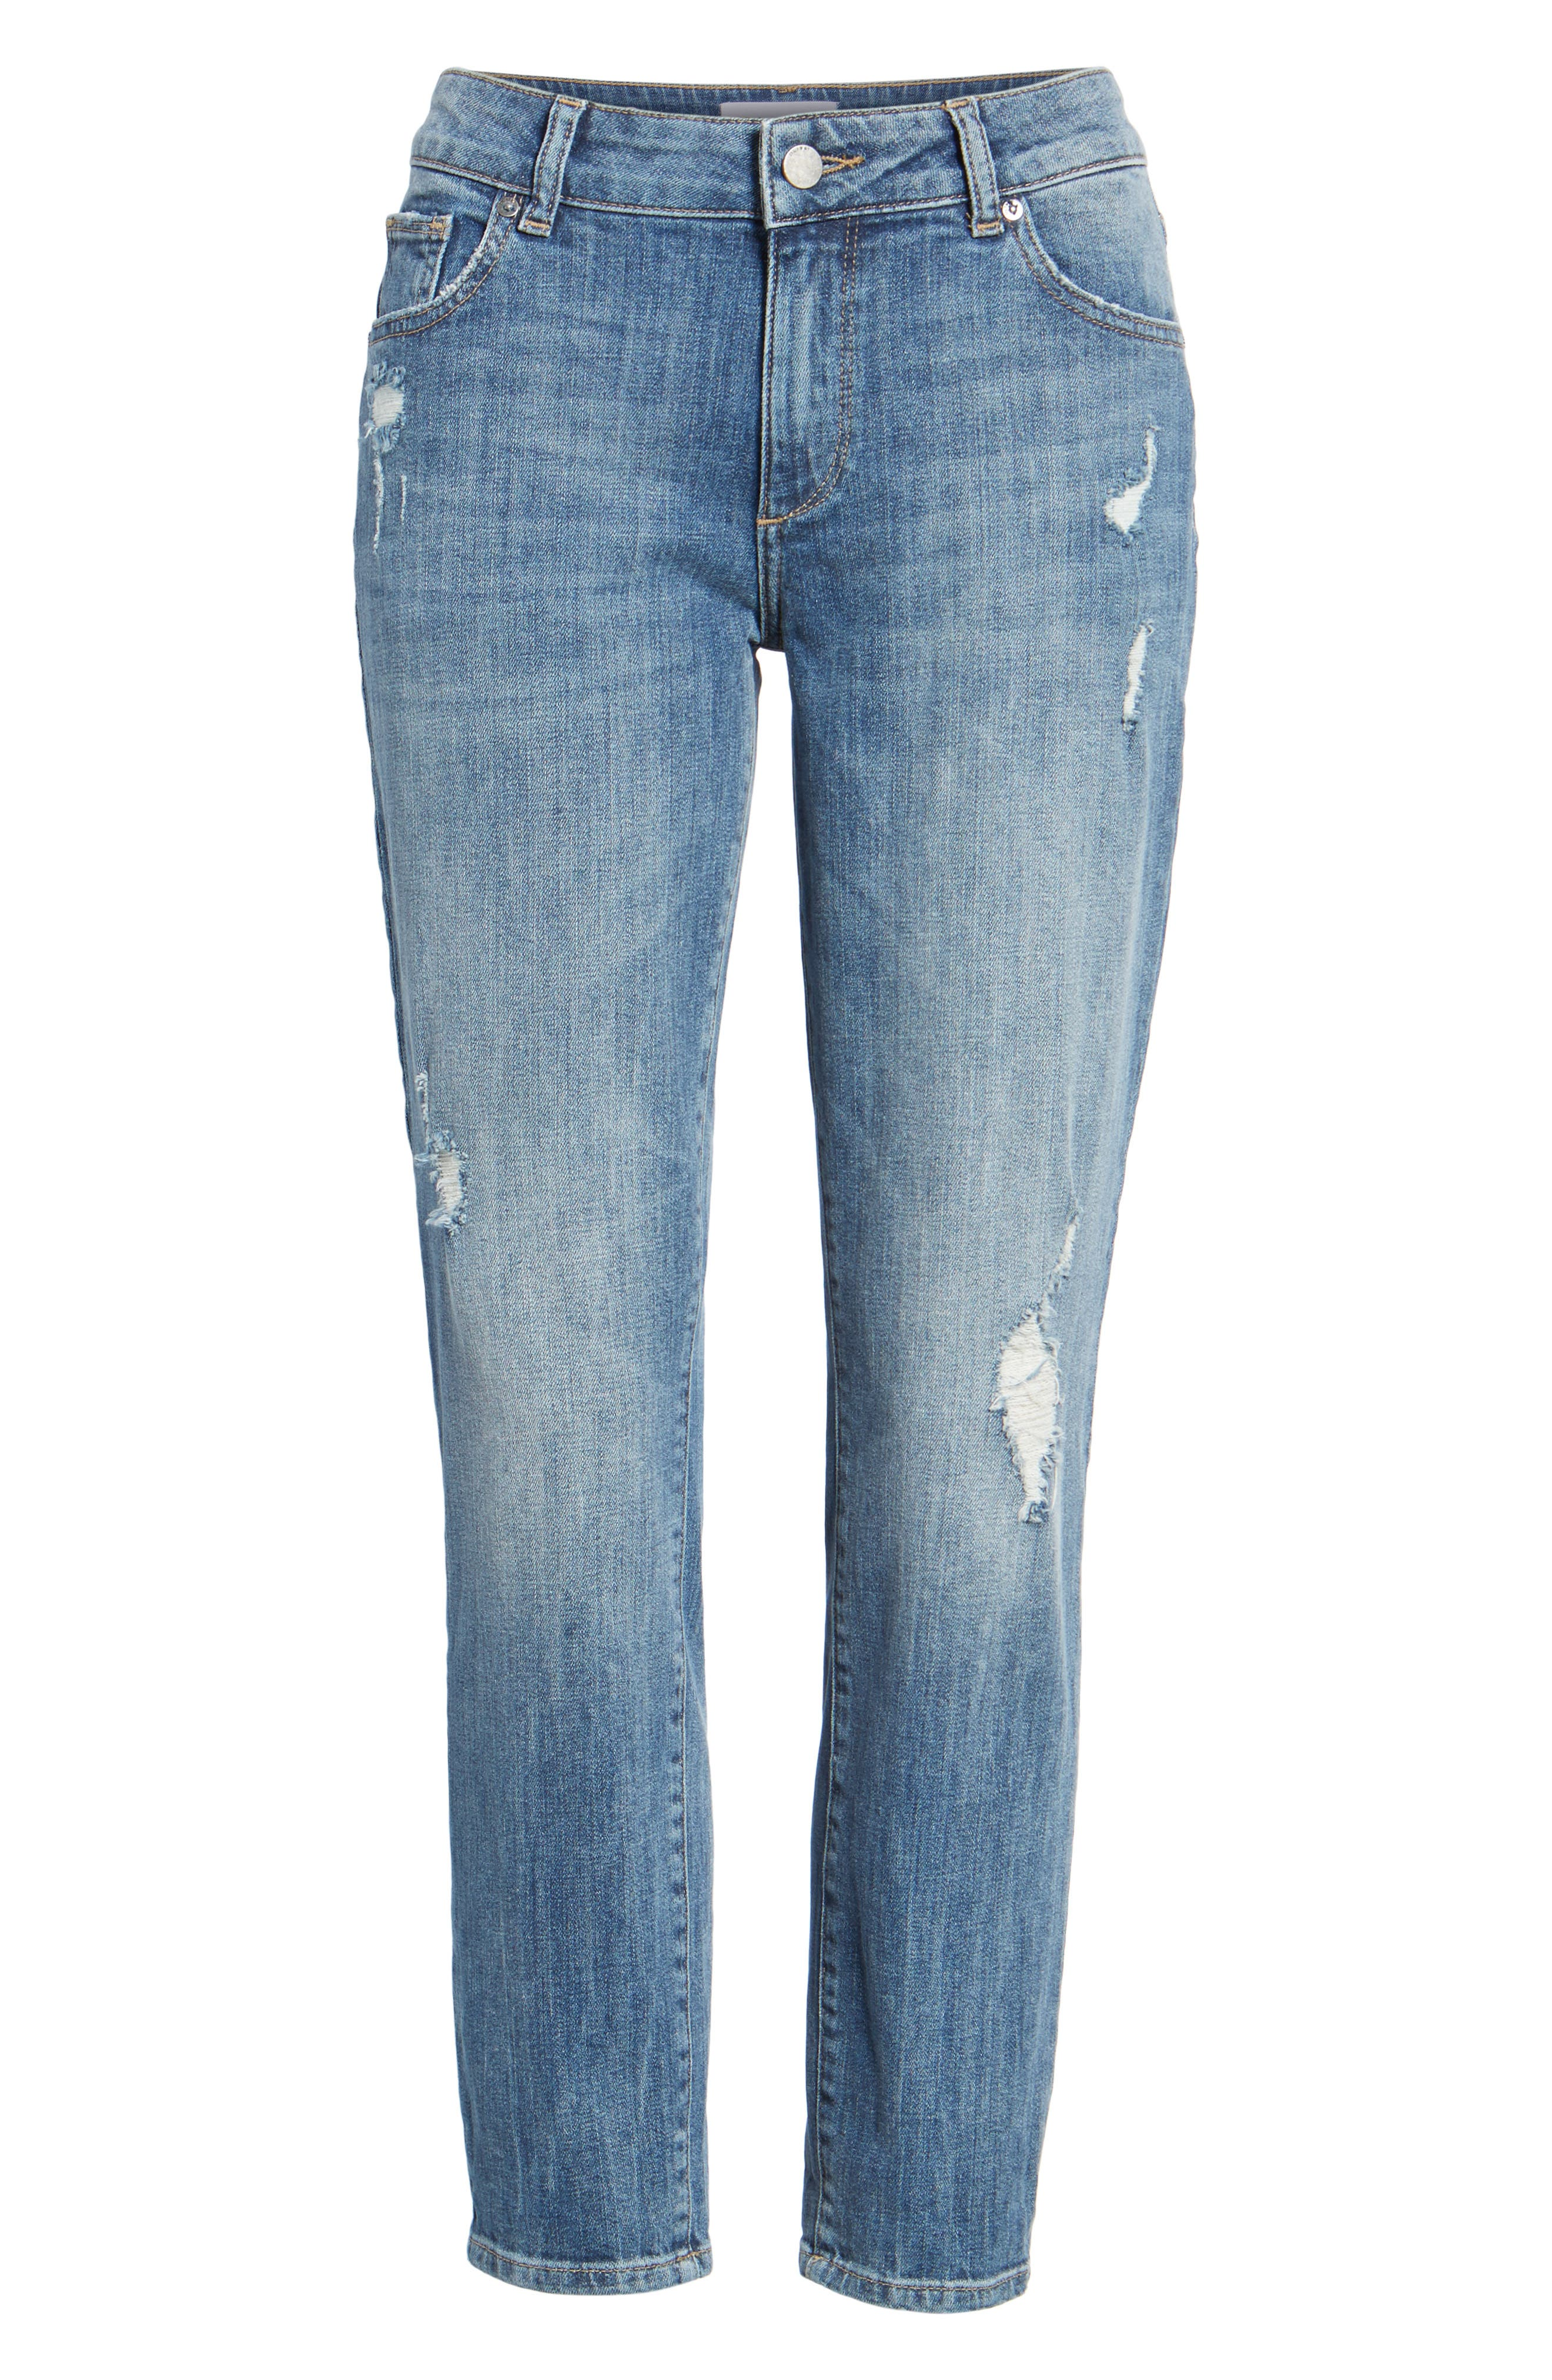 Davis Ankle Girlfriend Jeans,                             Alternate thumbnail 7, color,                             Alamo